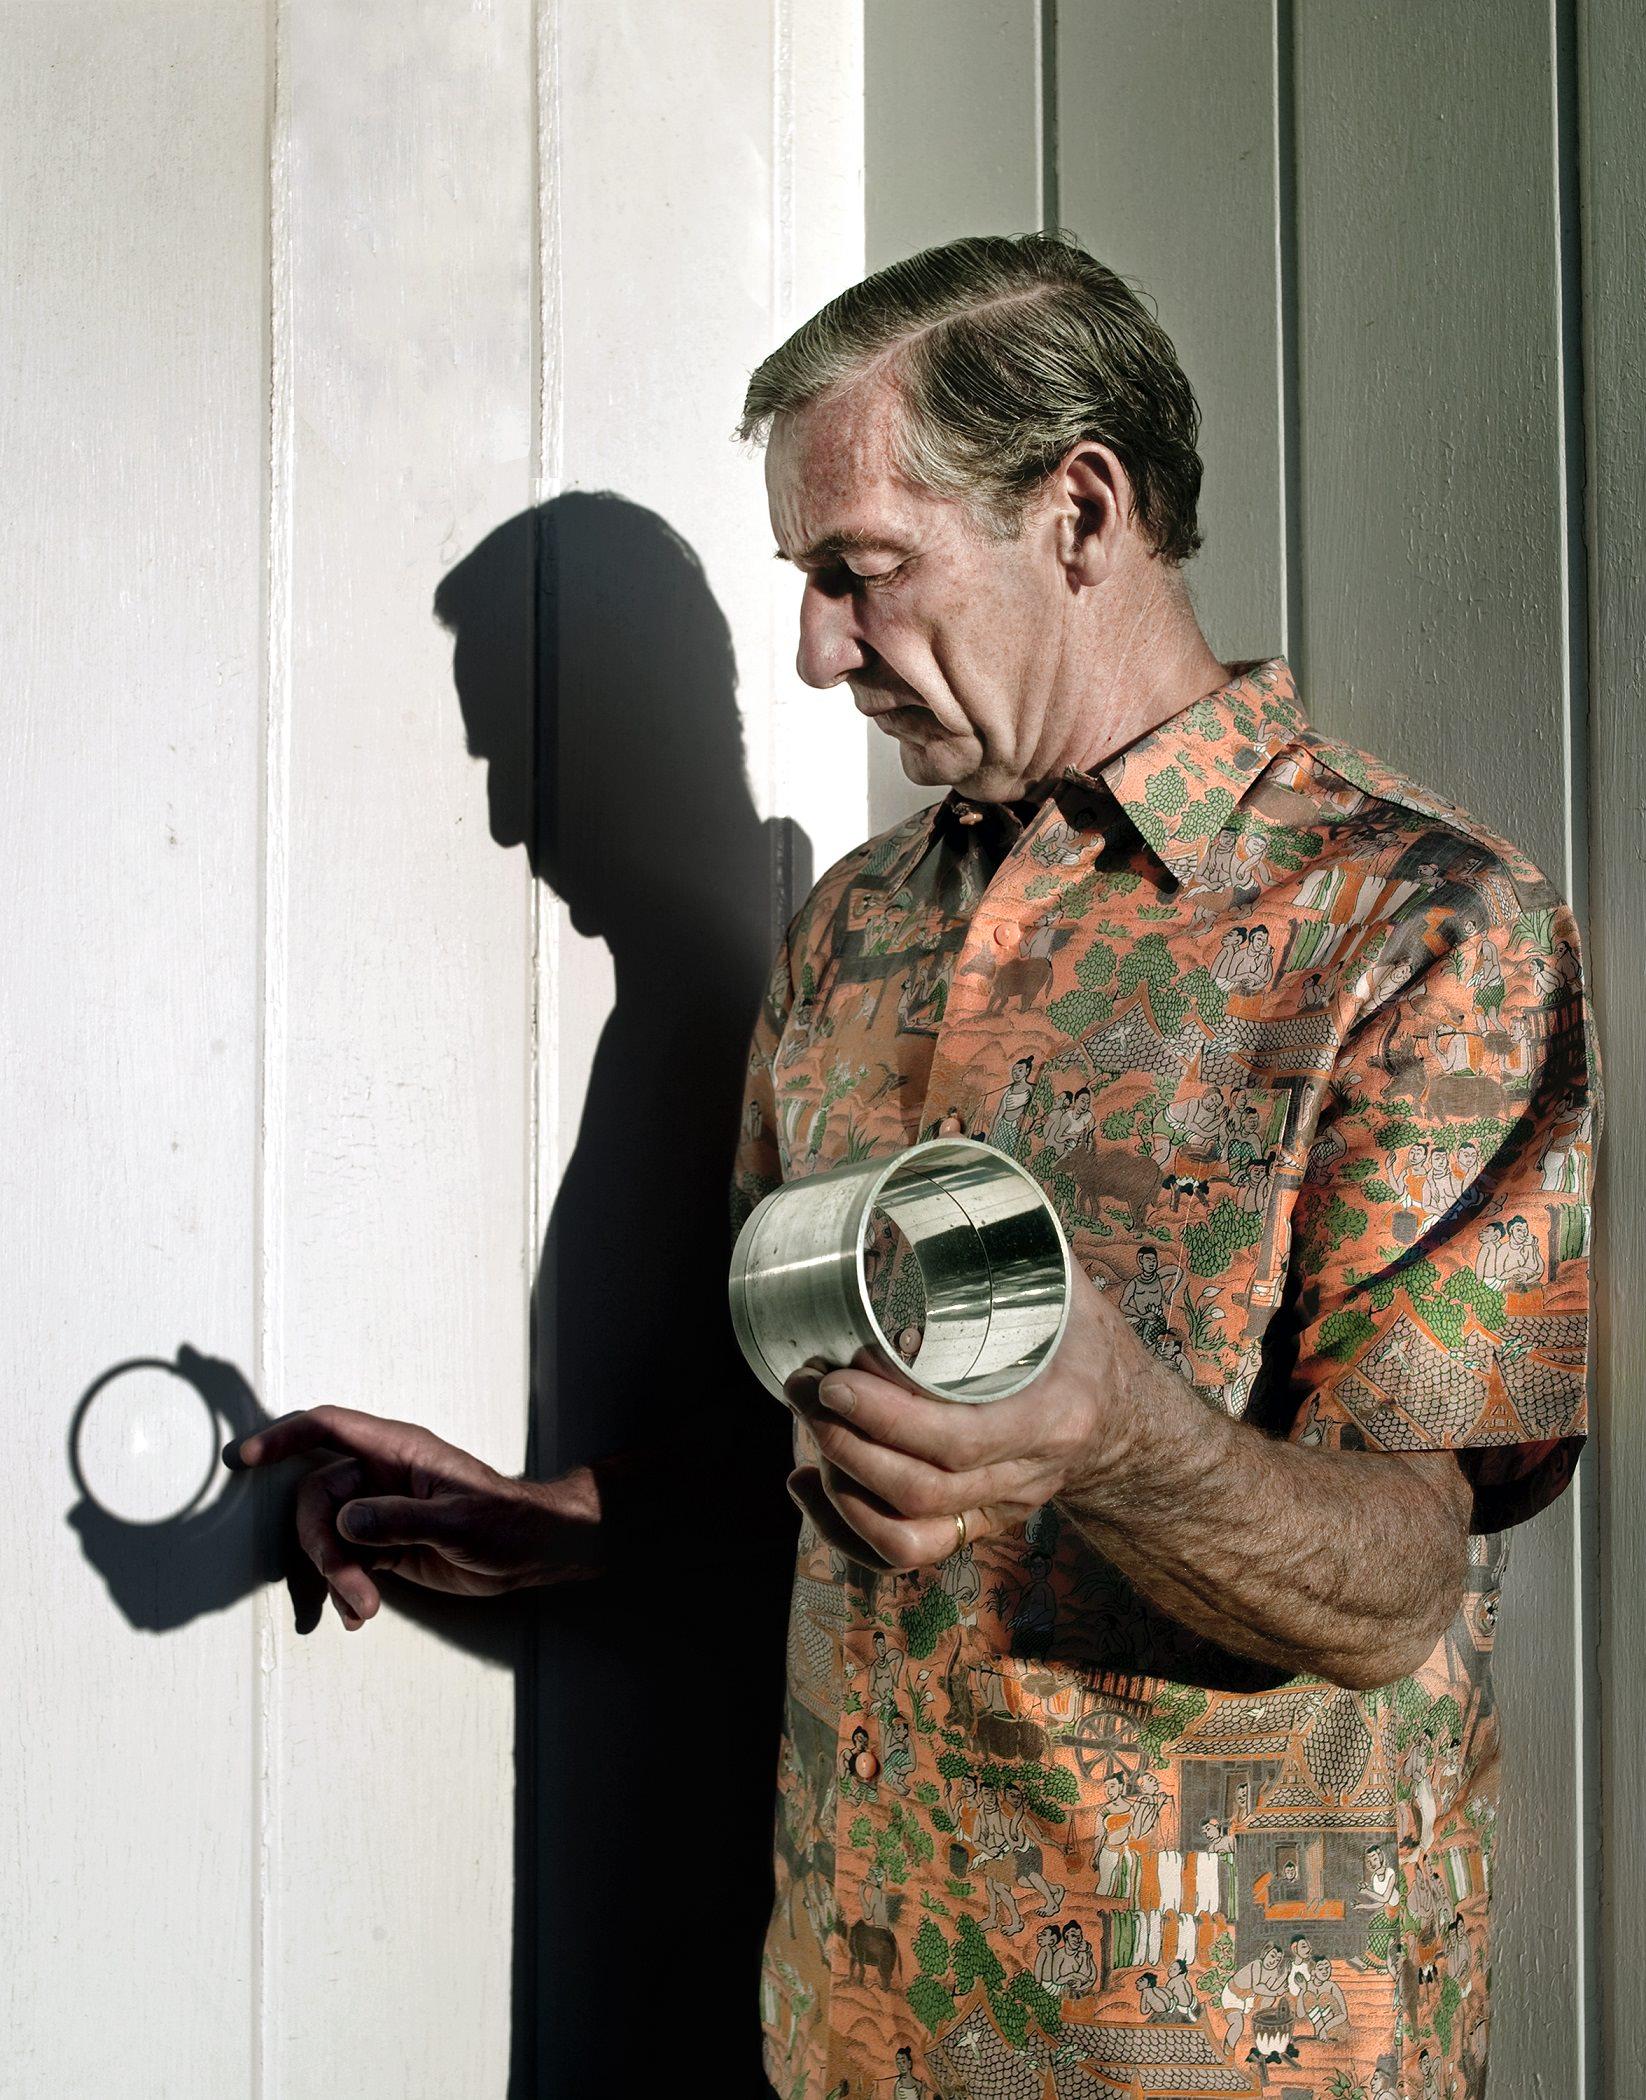 Szatmári Gergely: Scientist/Scientist (American Idler sorozat/from the series American Idler), 2008